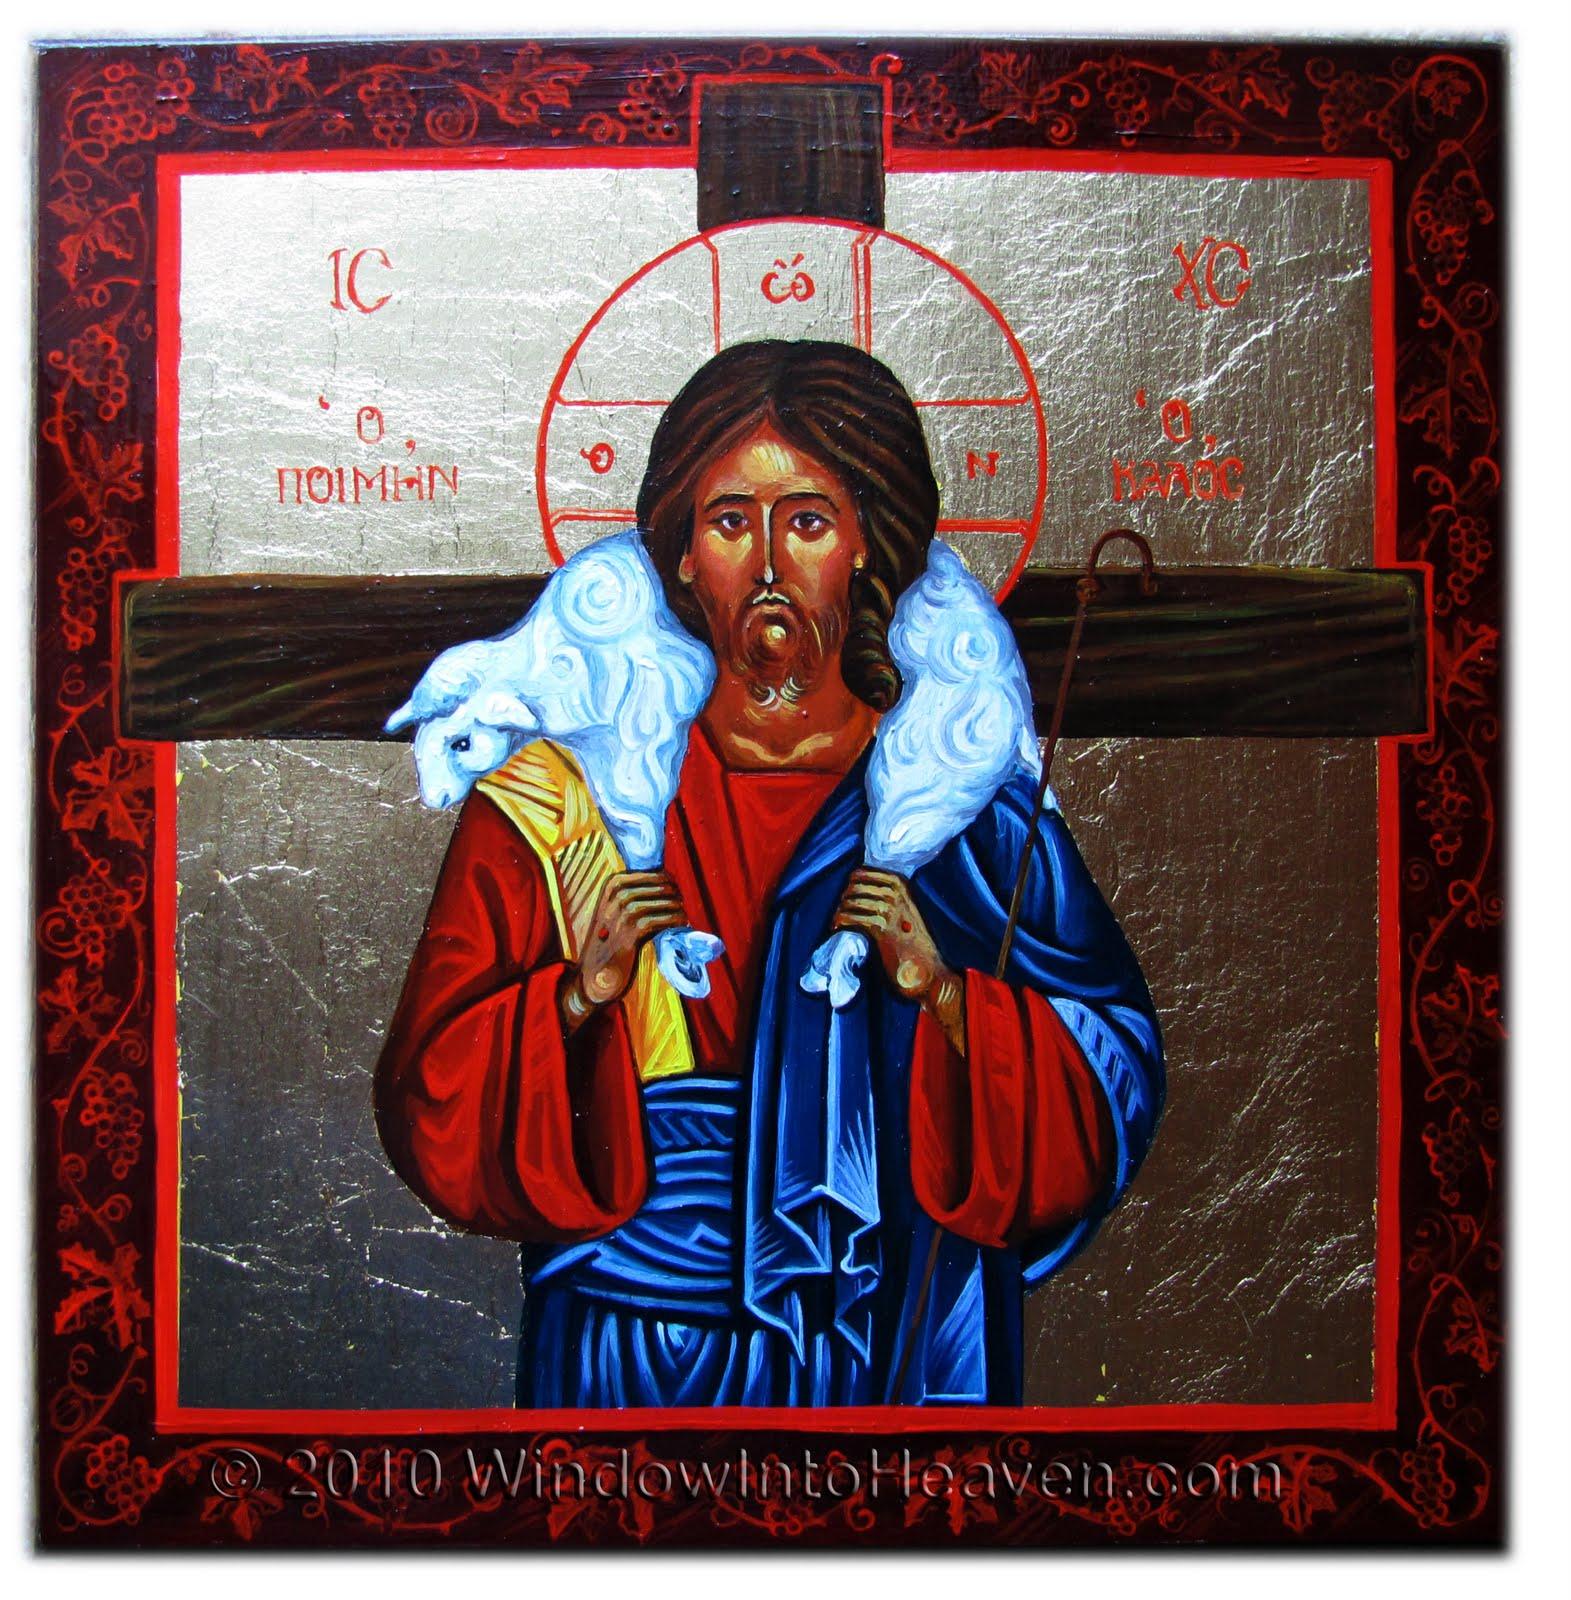 Il Buon Pastore dans immagini sacre Christ+the+Good+Shepherd+WindowIntoHeaven+Anna+Edelman